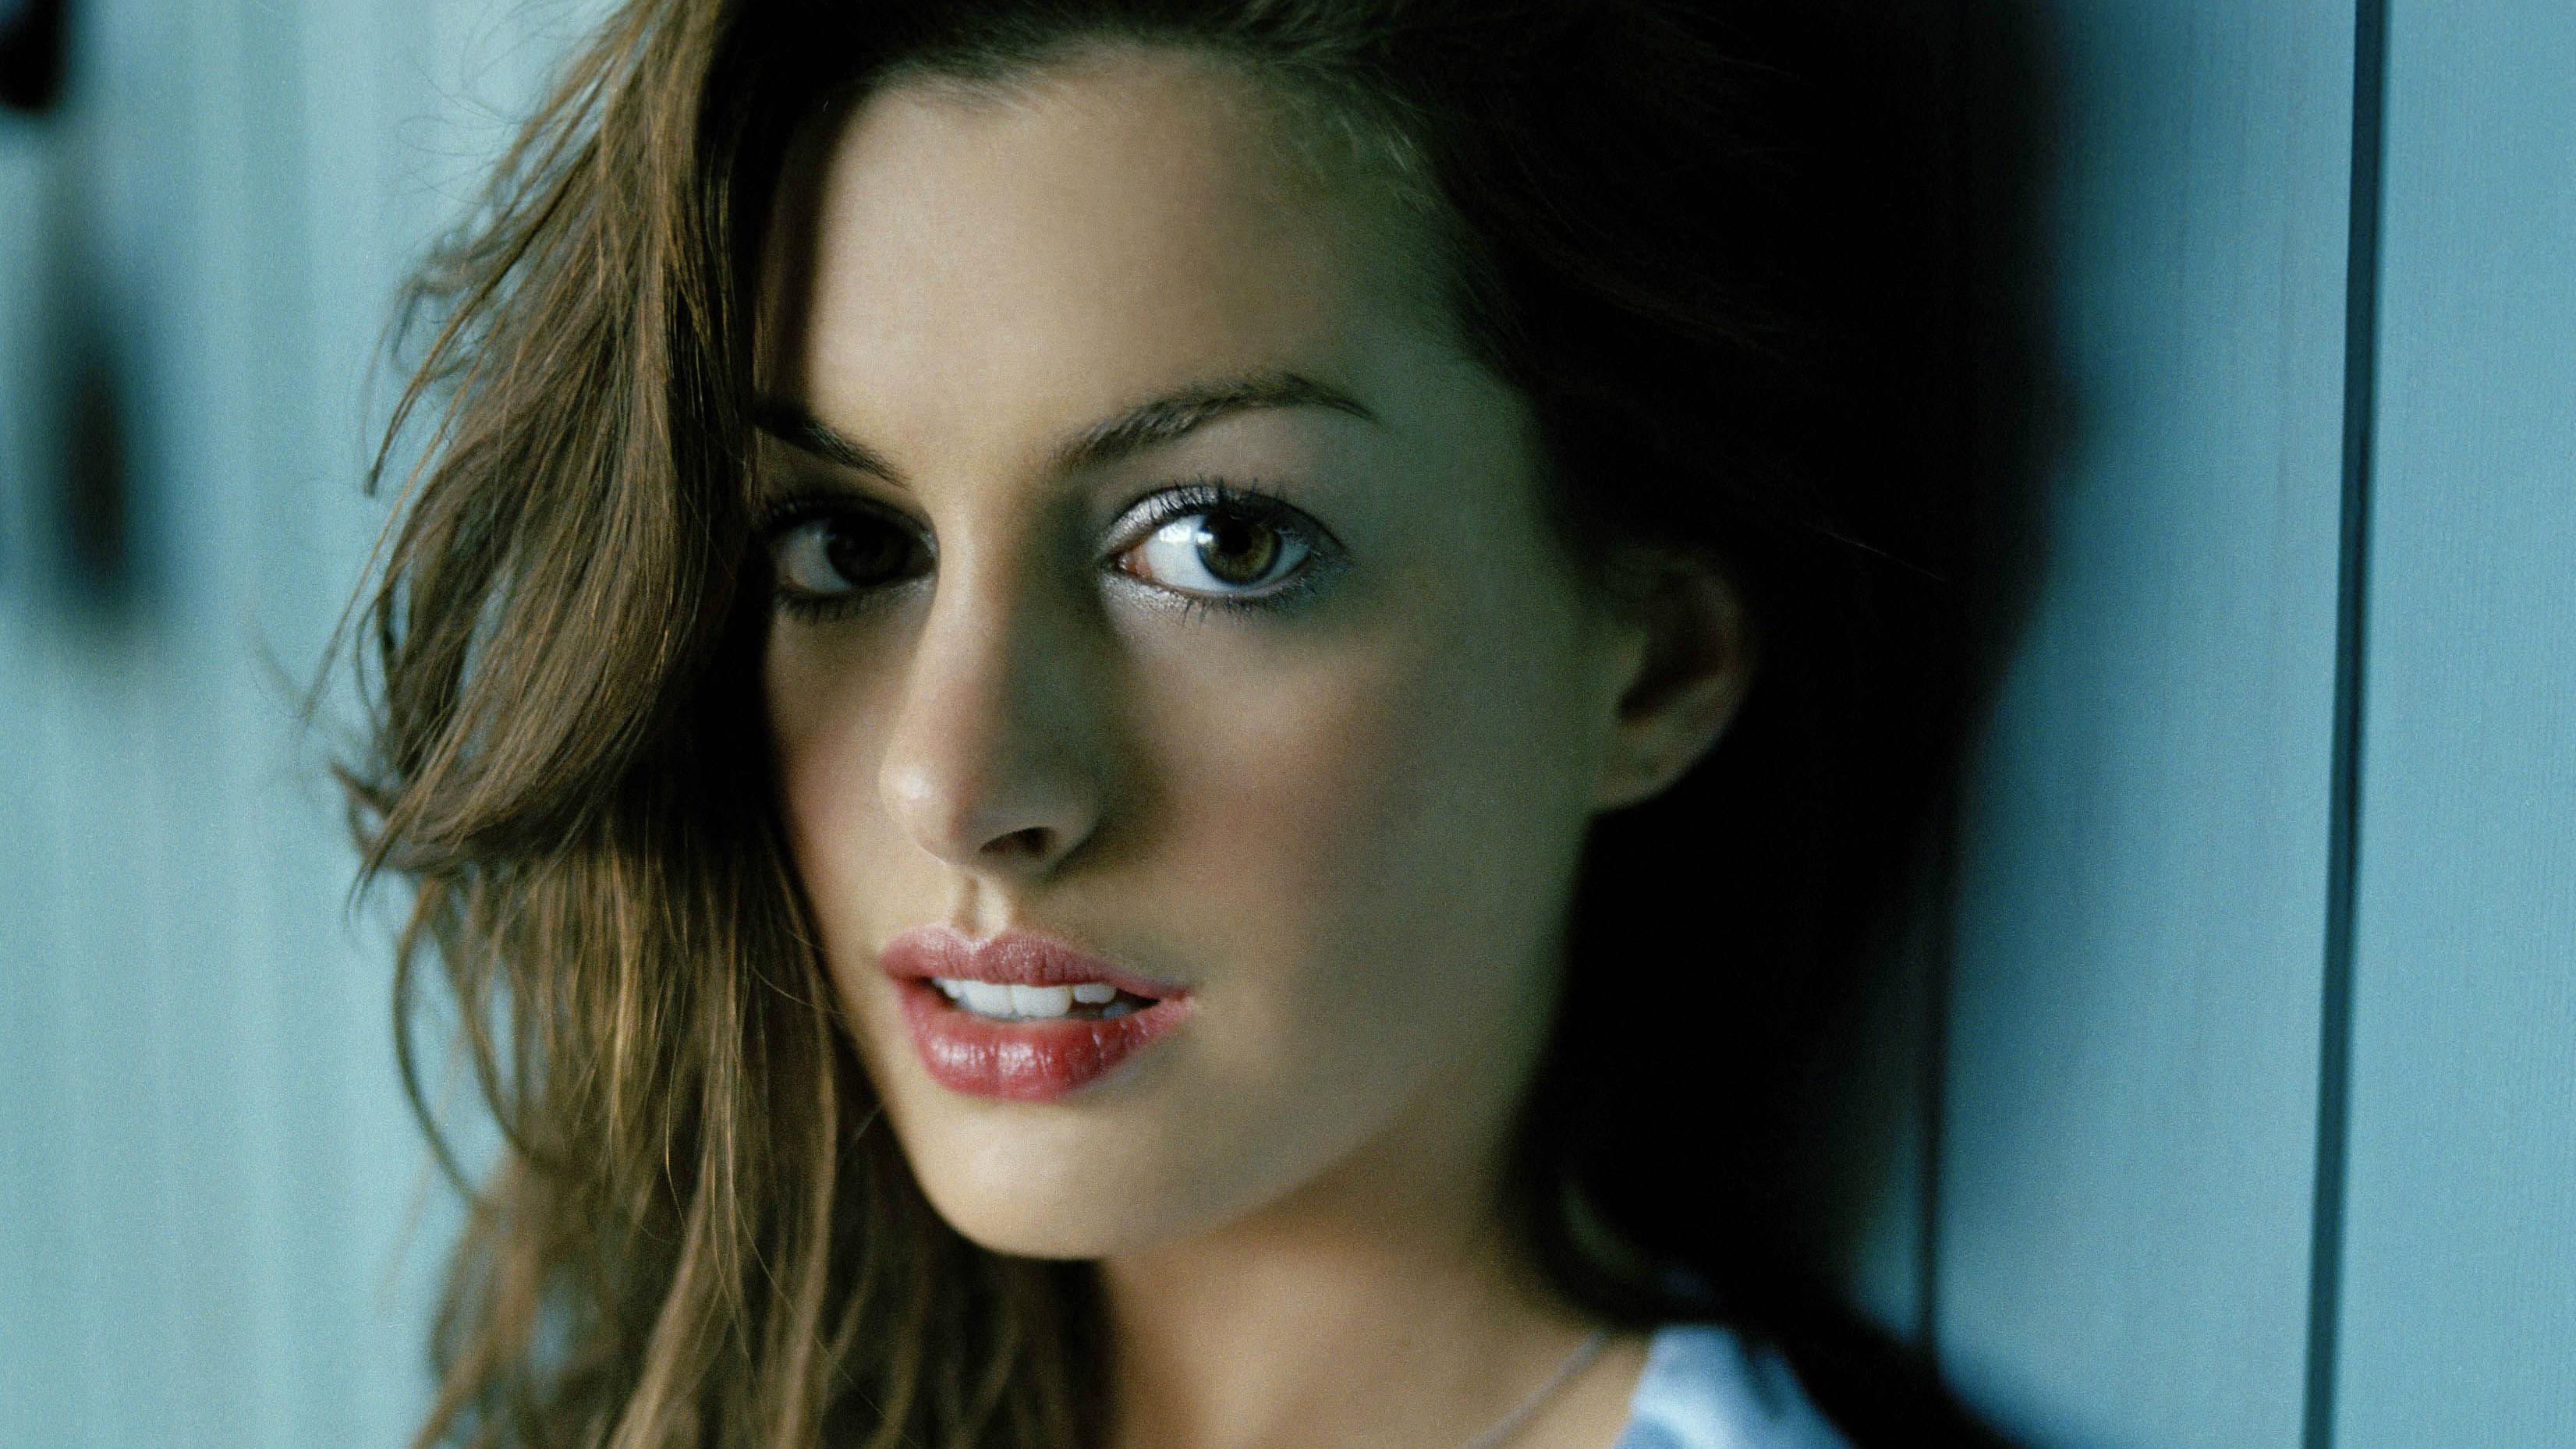 4k Anne Hathaway Hd Celebrities 4k Wallpapers Images